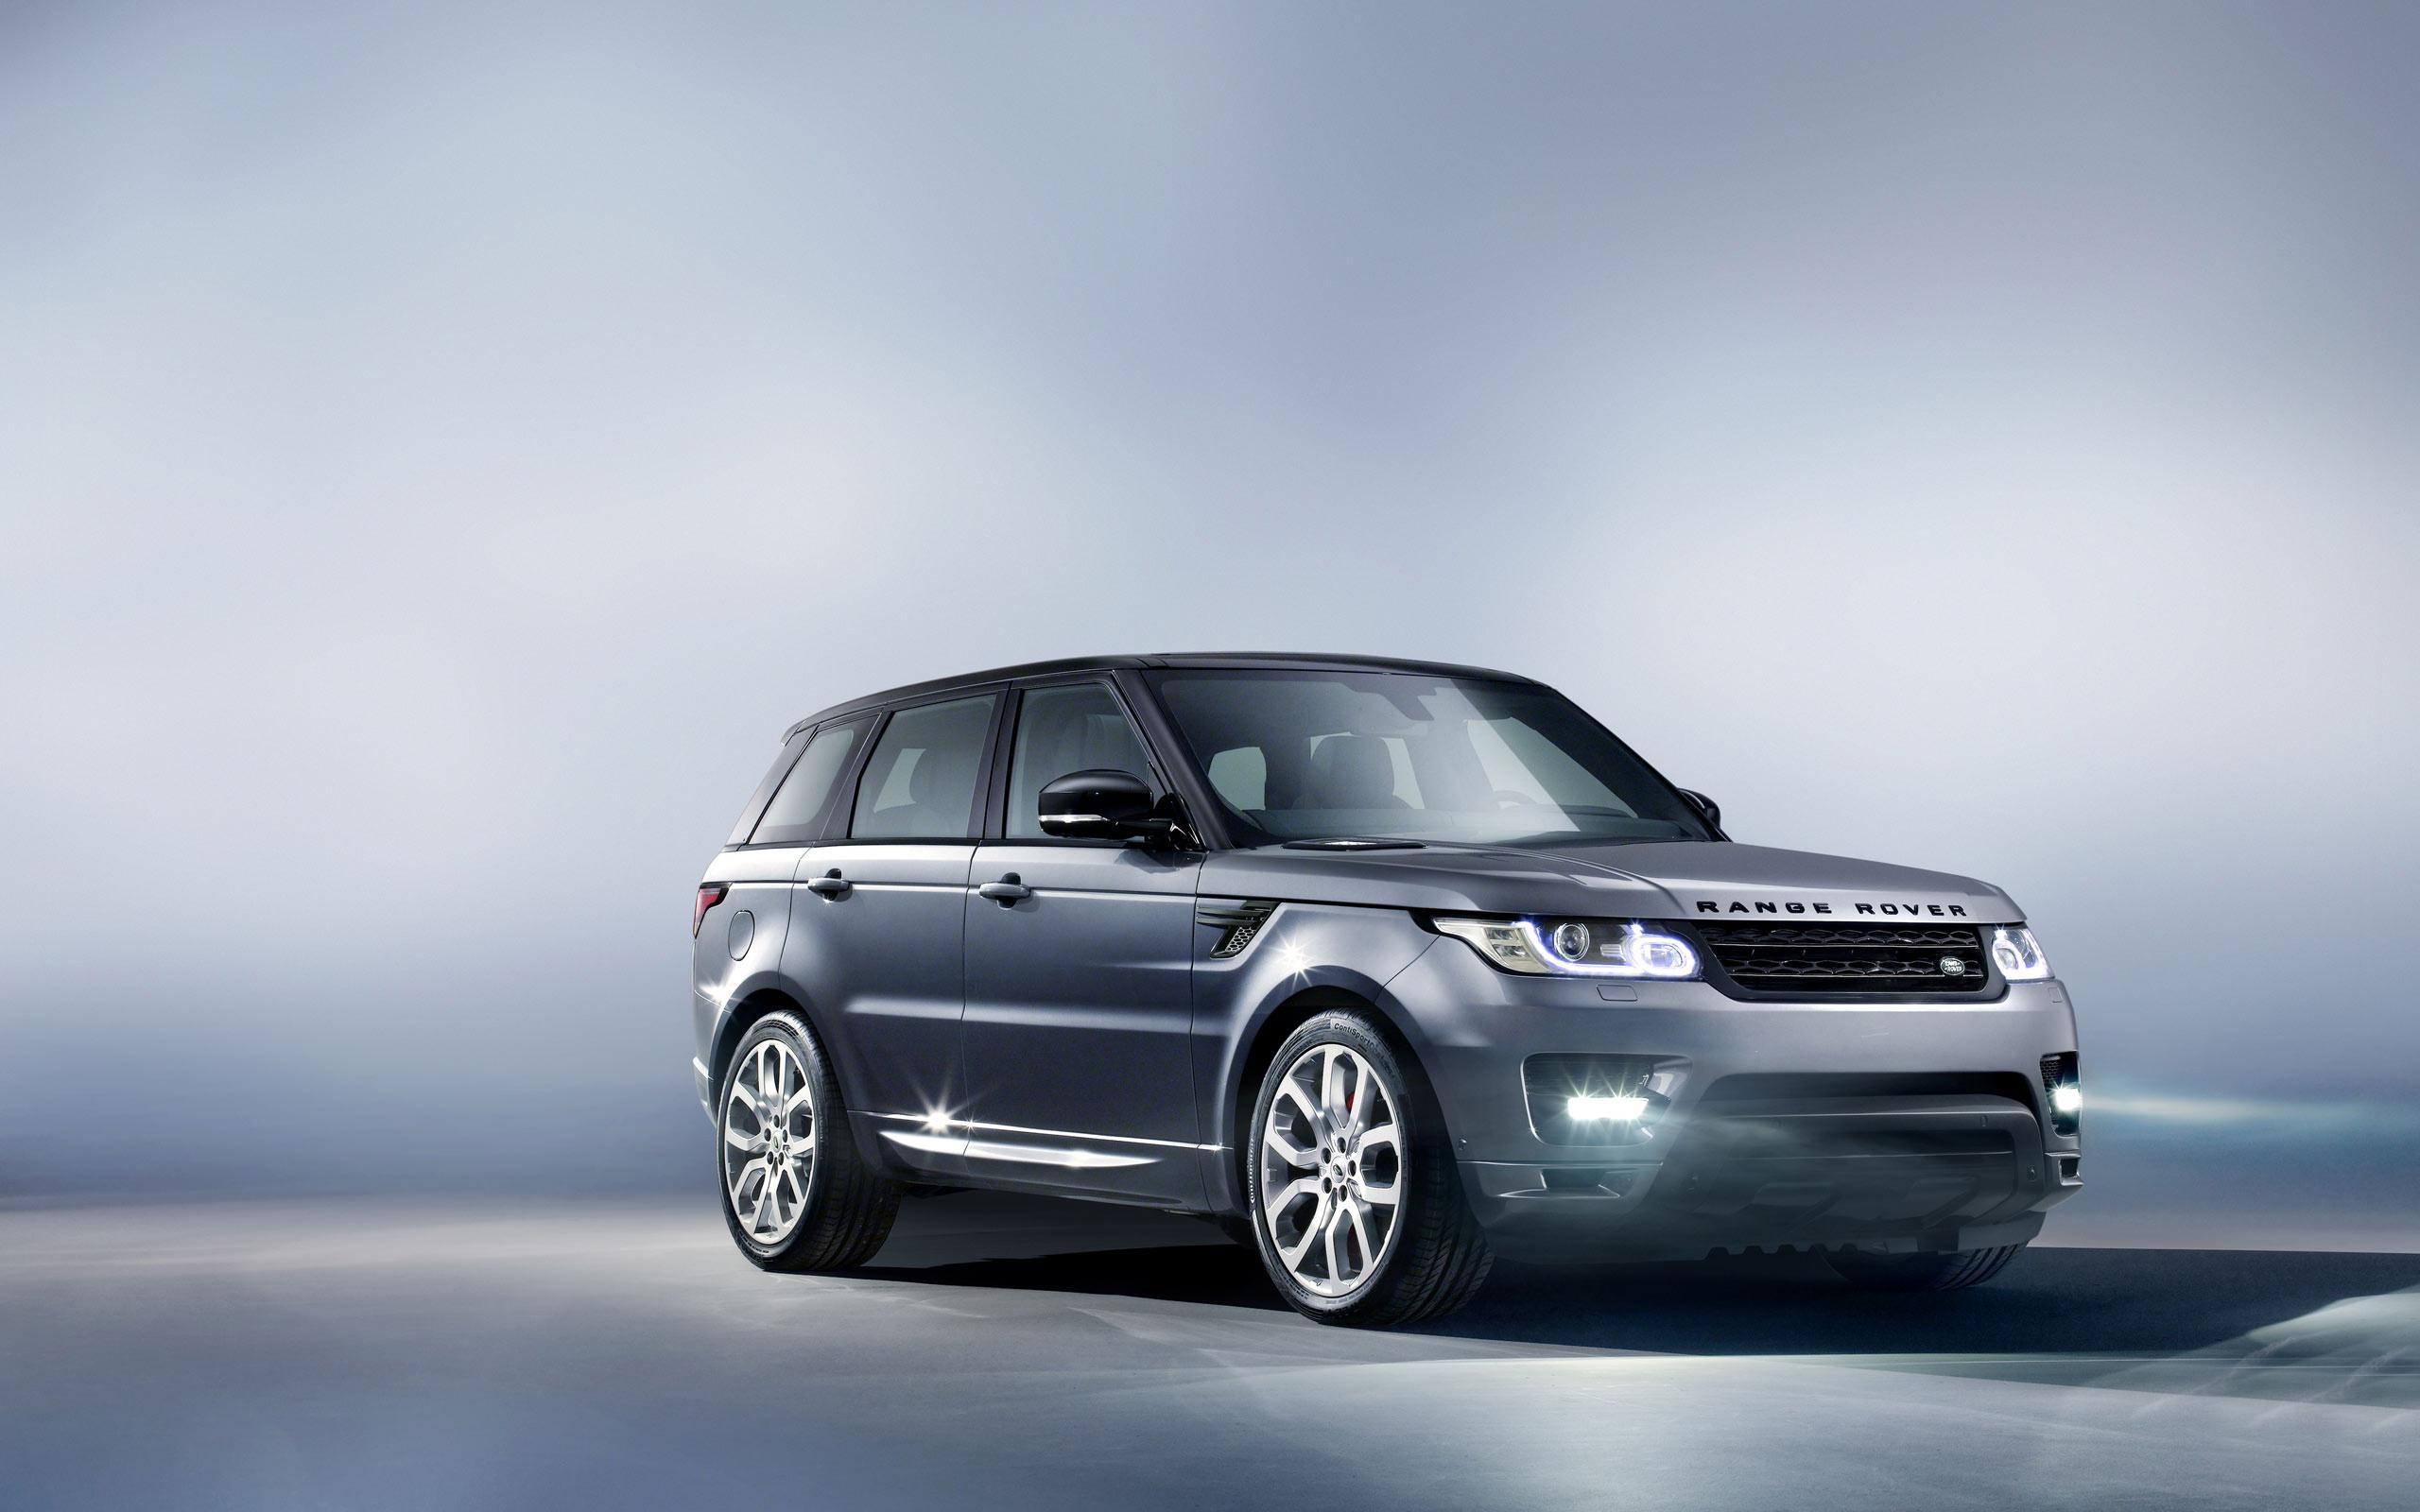 2014 land rover range rover sport 2 wallpaper hd car wallpapers. Black Bedroom Furniture Sets. Home Design Ideas